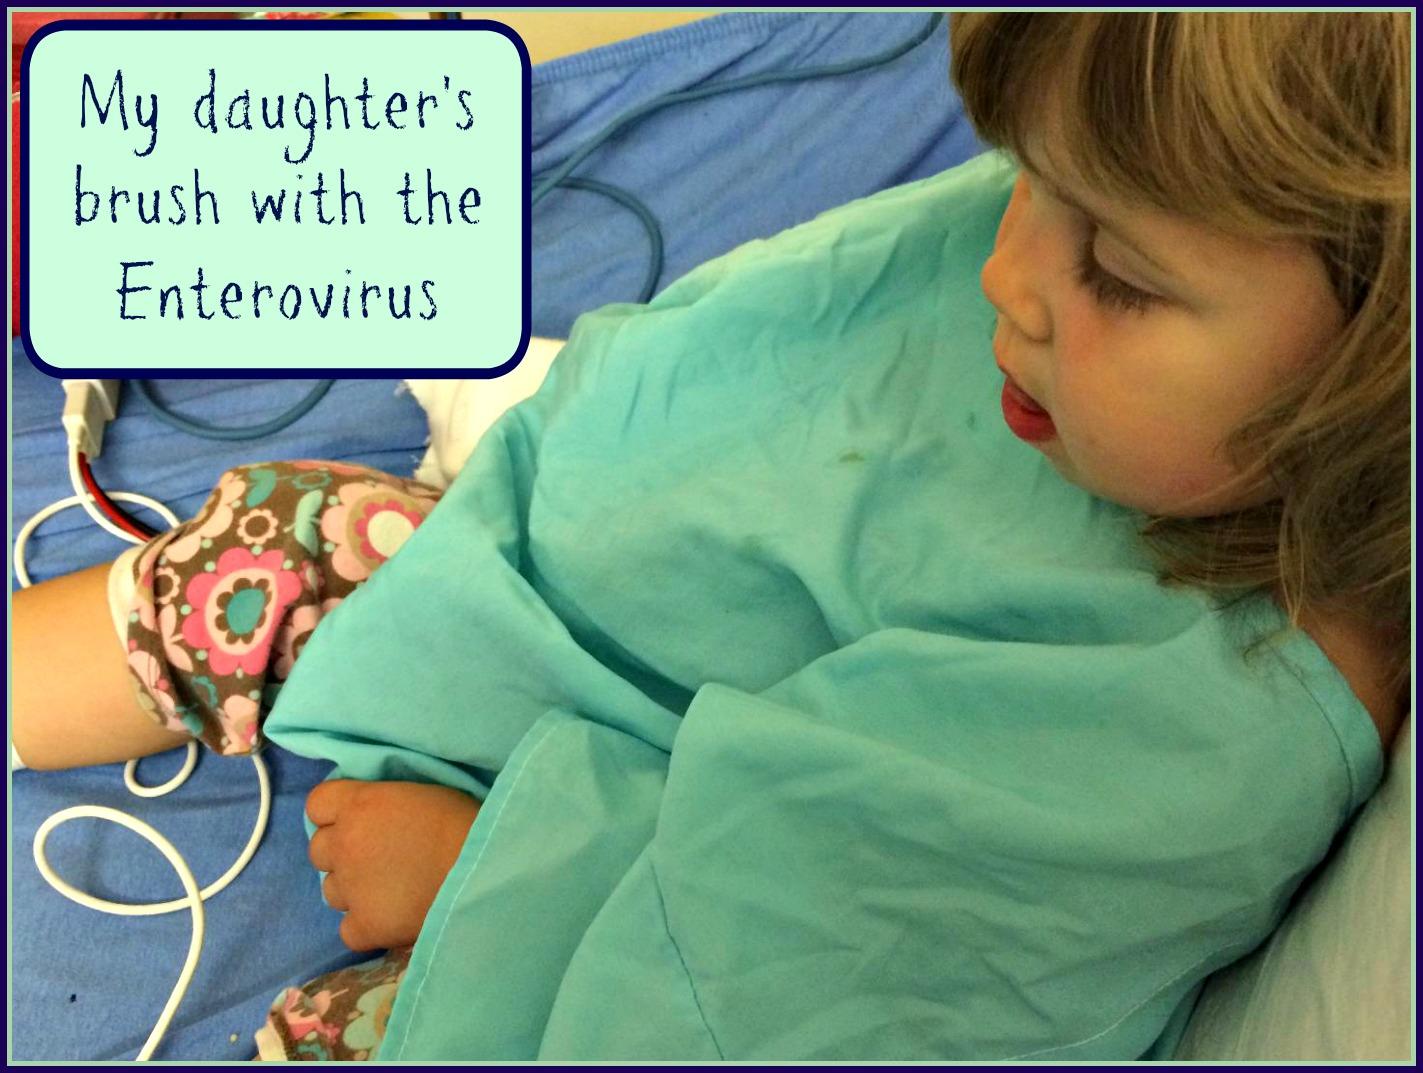 My Daughter's Brush With the Enterovirus